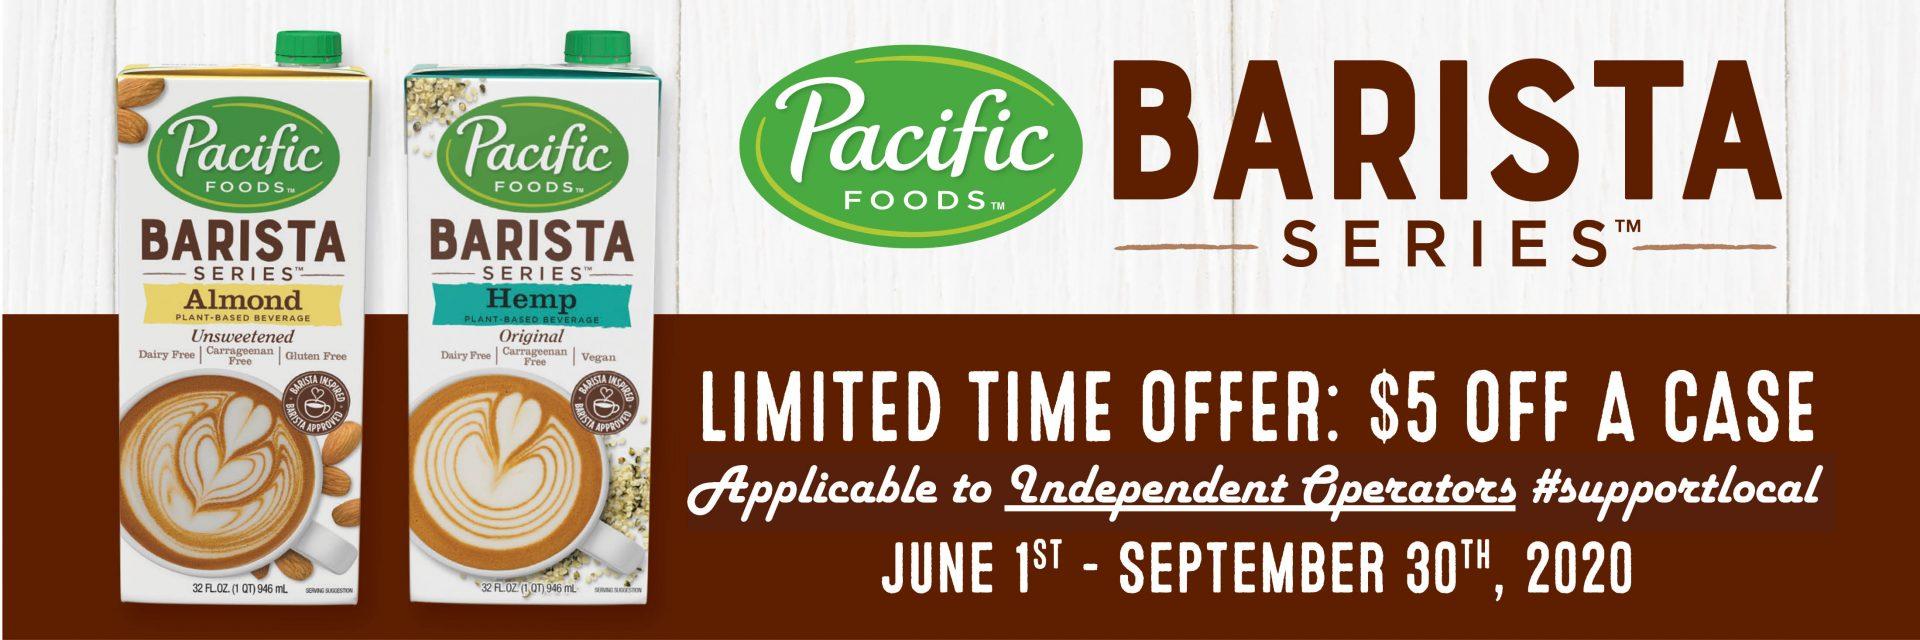 Pacific Barista Series Promo Deal